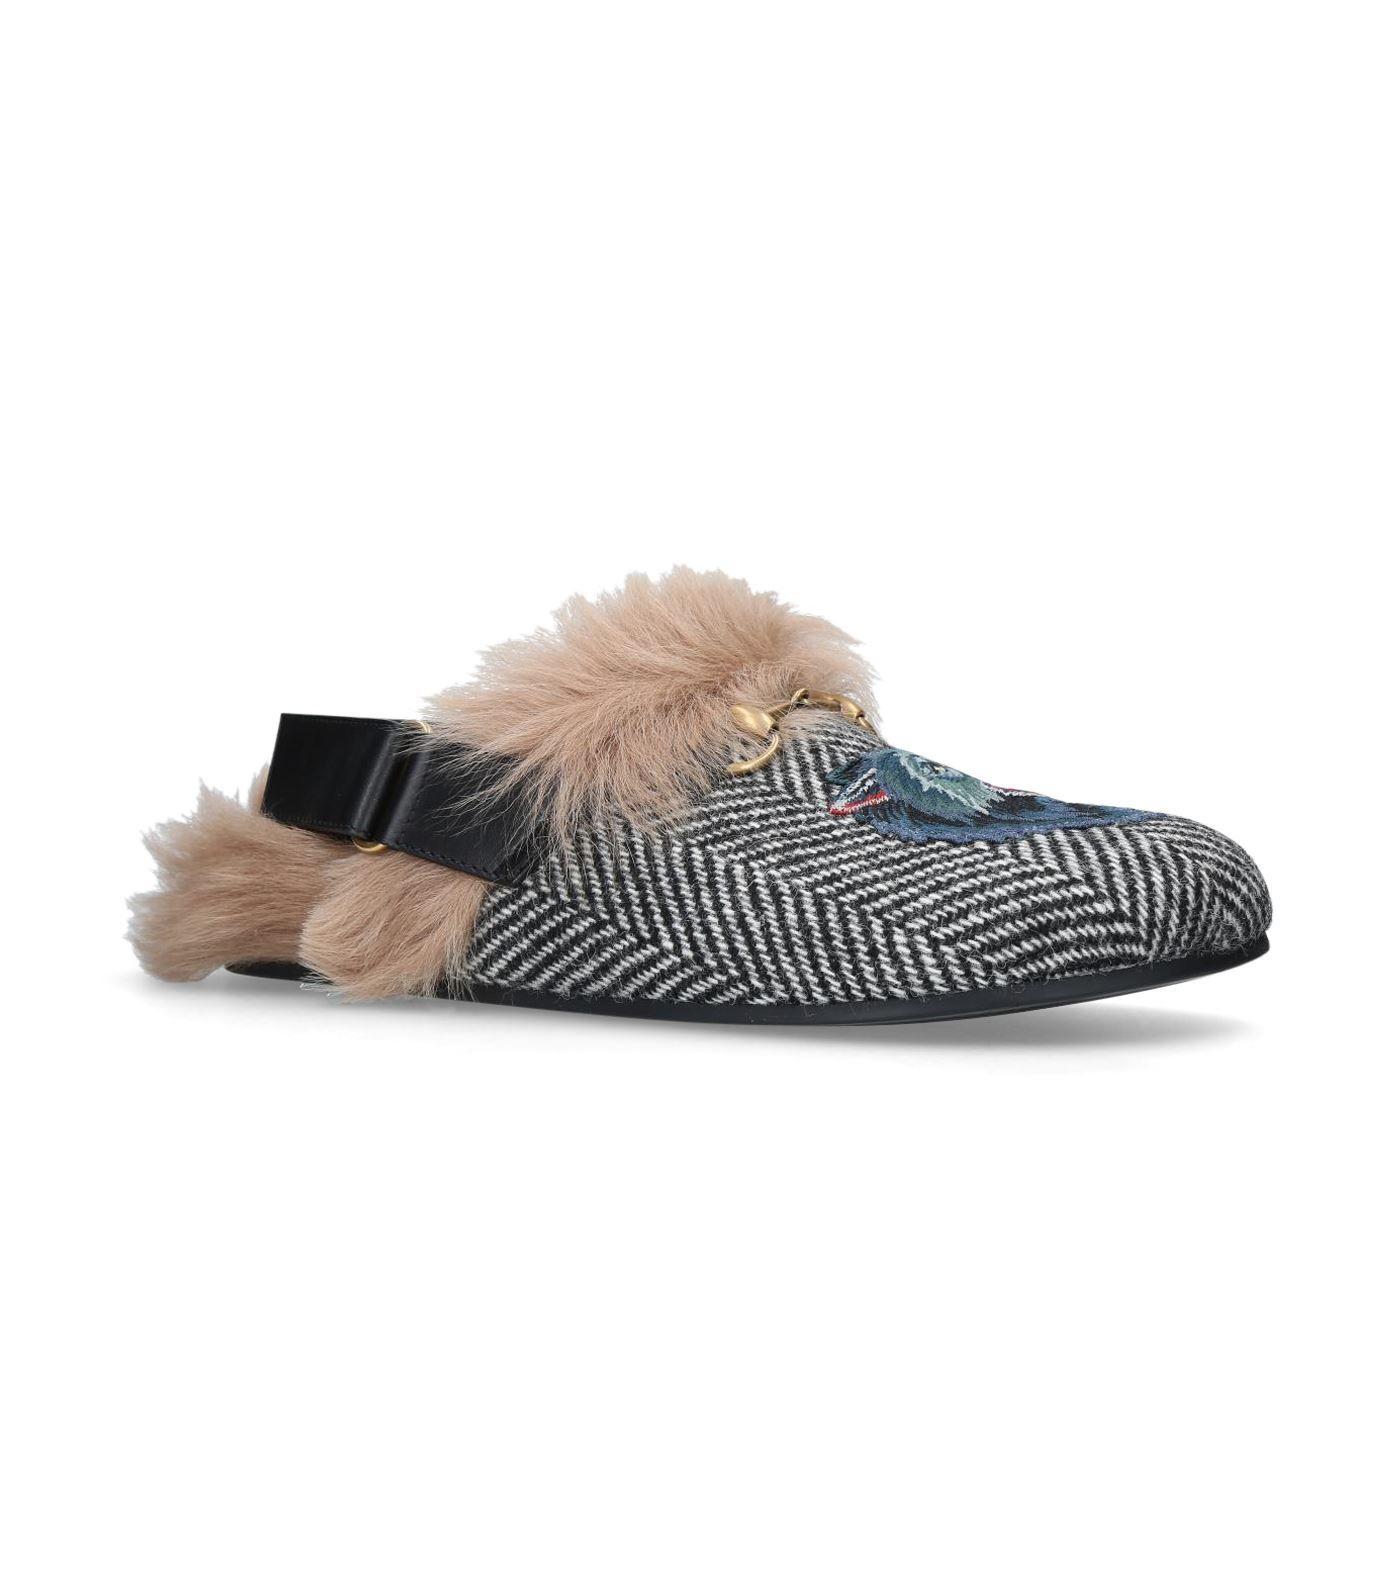 Slippers, Gucci, Gucci horsebit